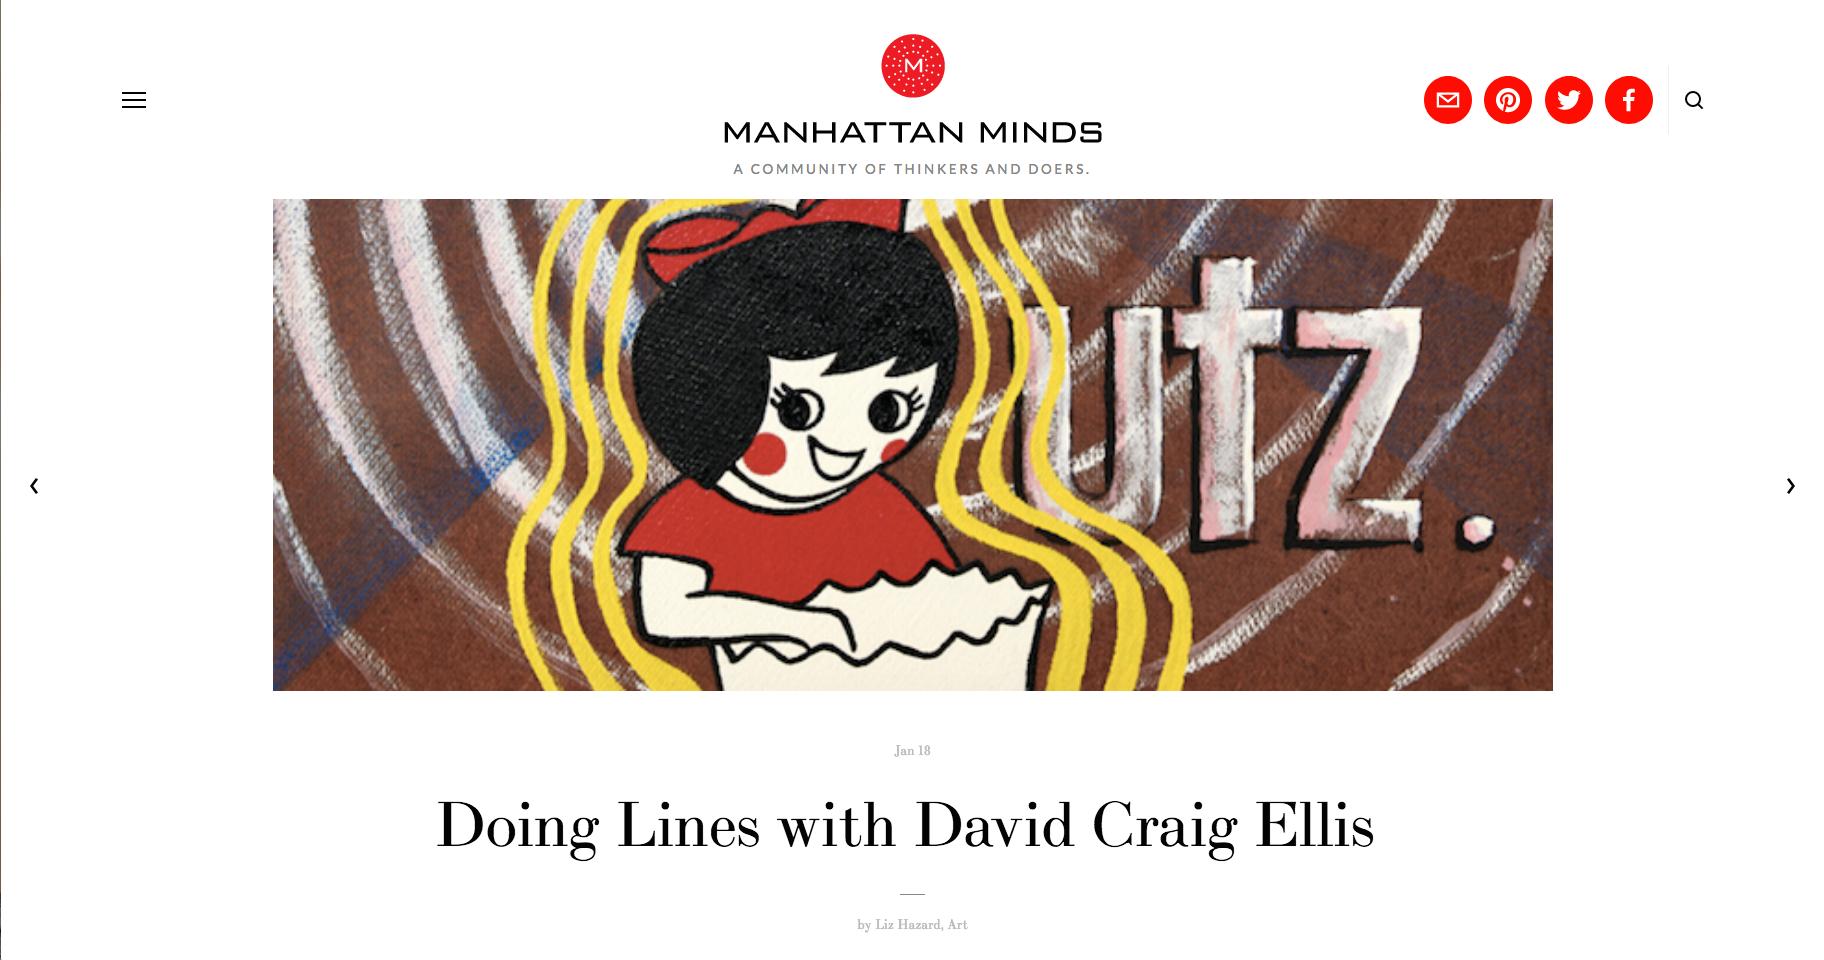 Manhattan Minds - Doing Lines With David Craig Ellis